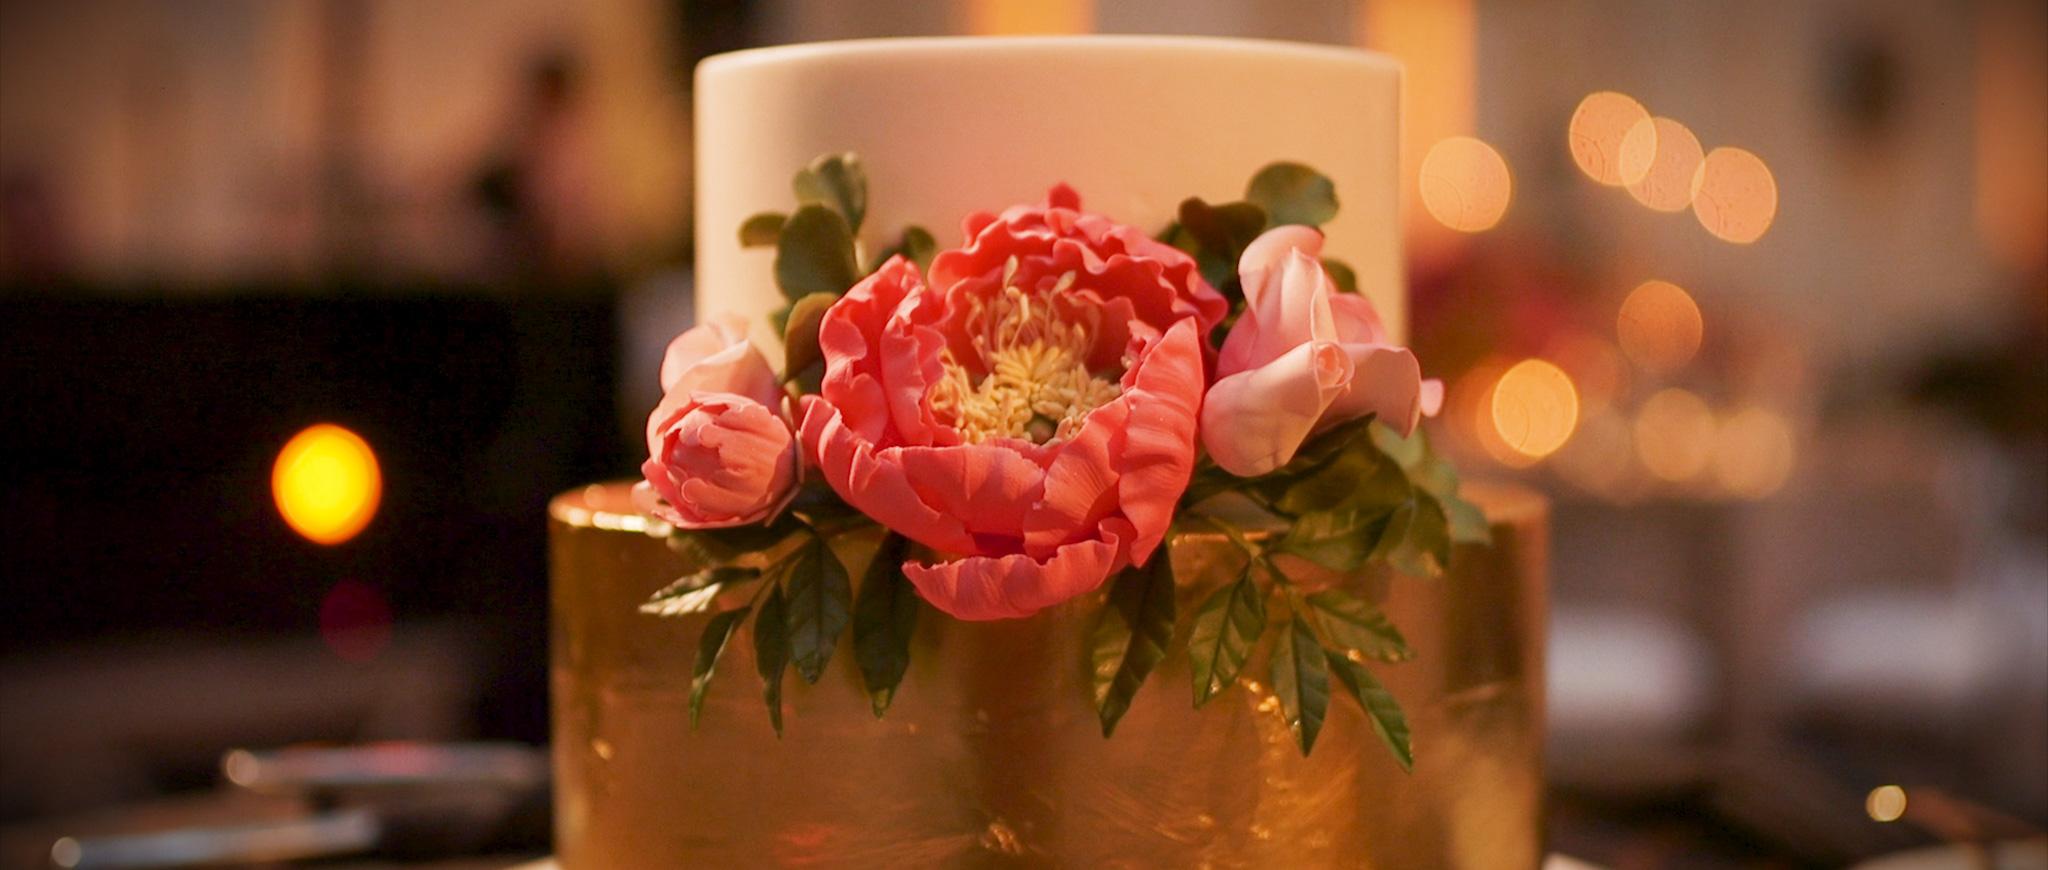 field-museum-wedding-video-8.jpg